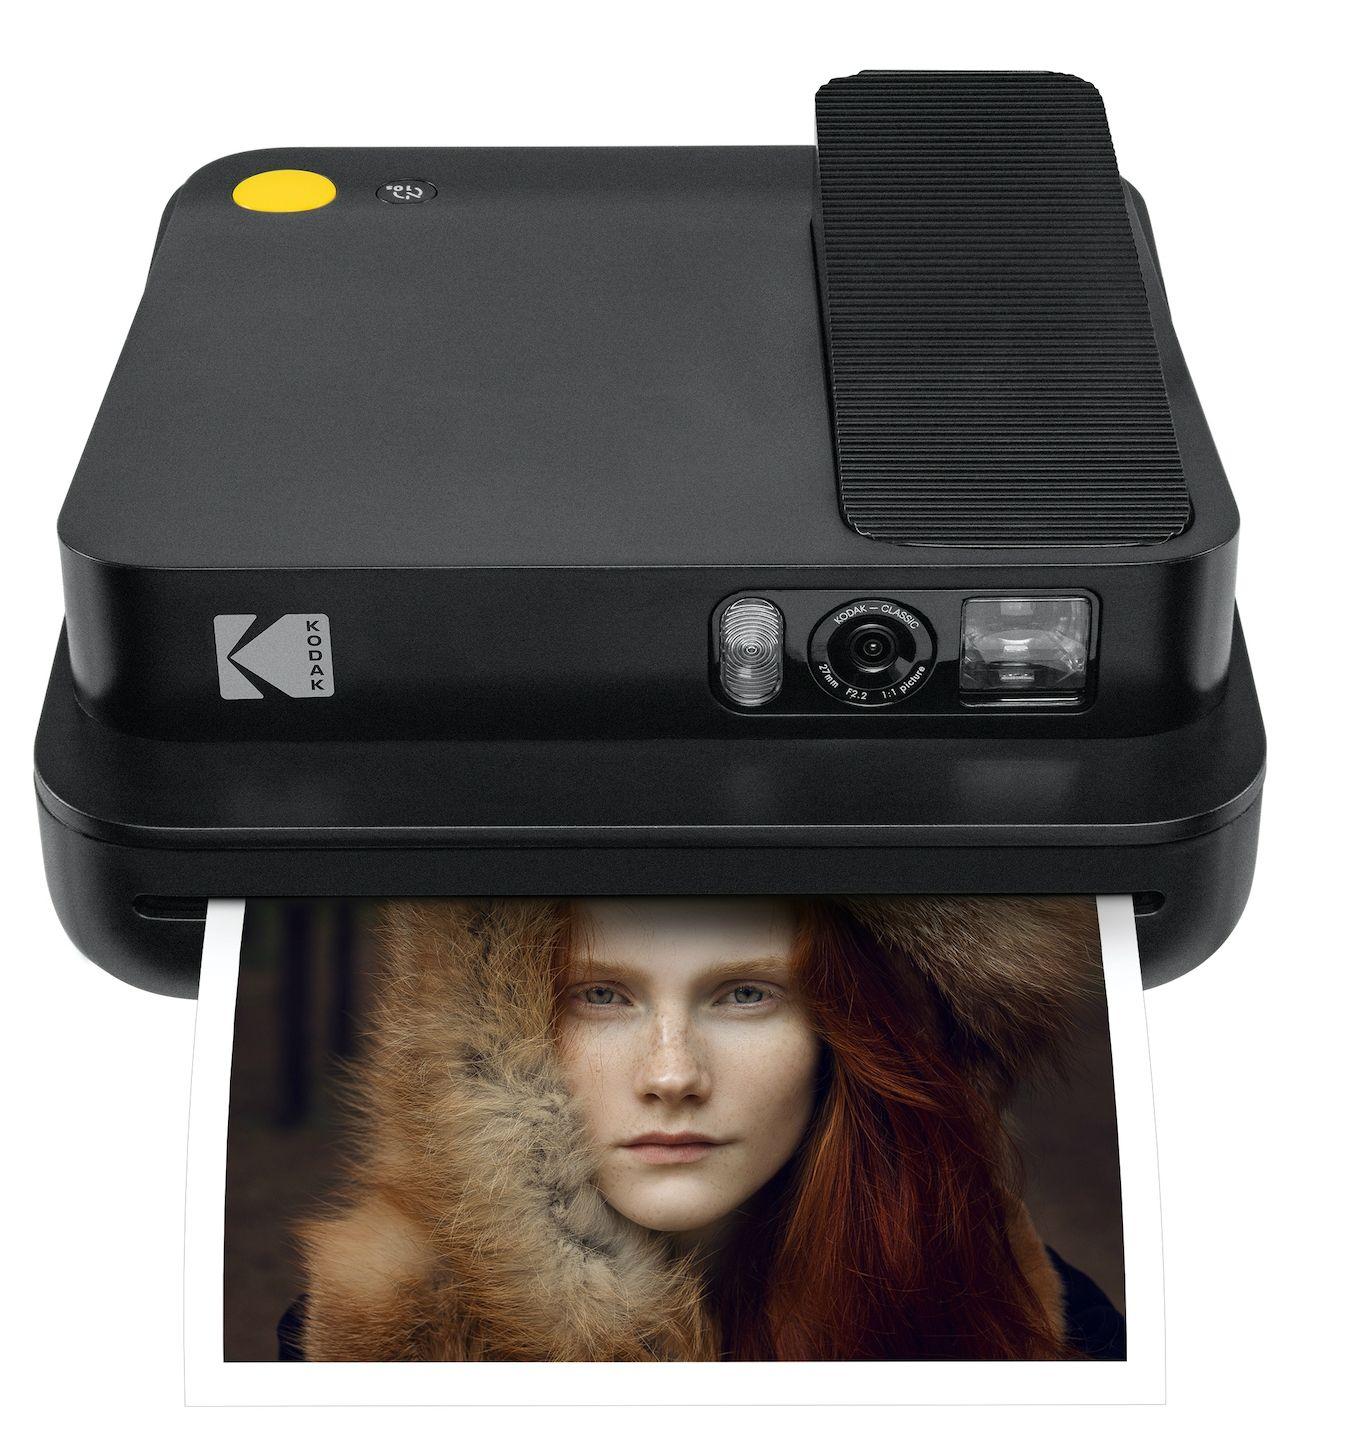 Моментален фотоапарат Kodak - Smile Classic, черен - 1